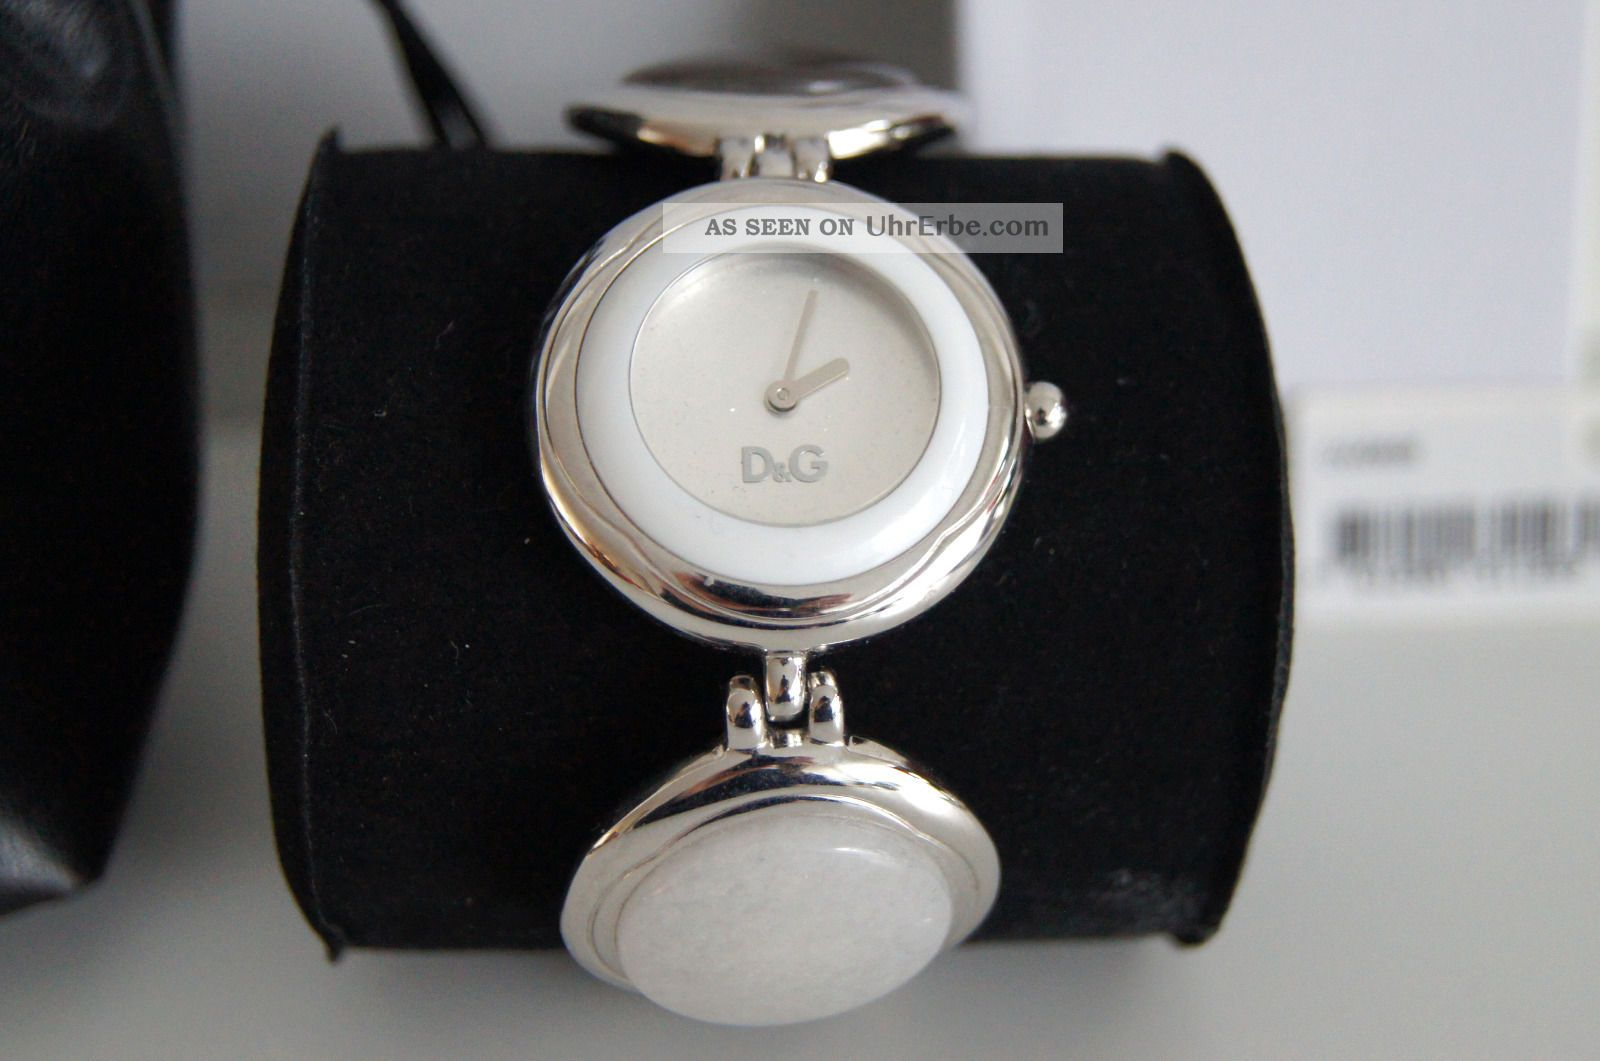 D&g Dolce&gabbana Salome Dw0658 Damen Armbanduhr Uhr Wie Armbanduhren Bild